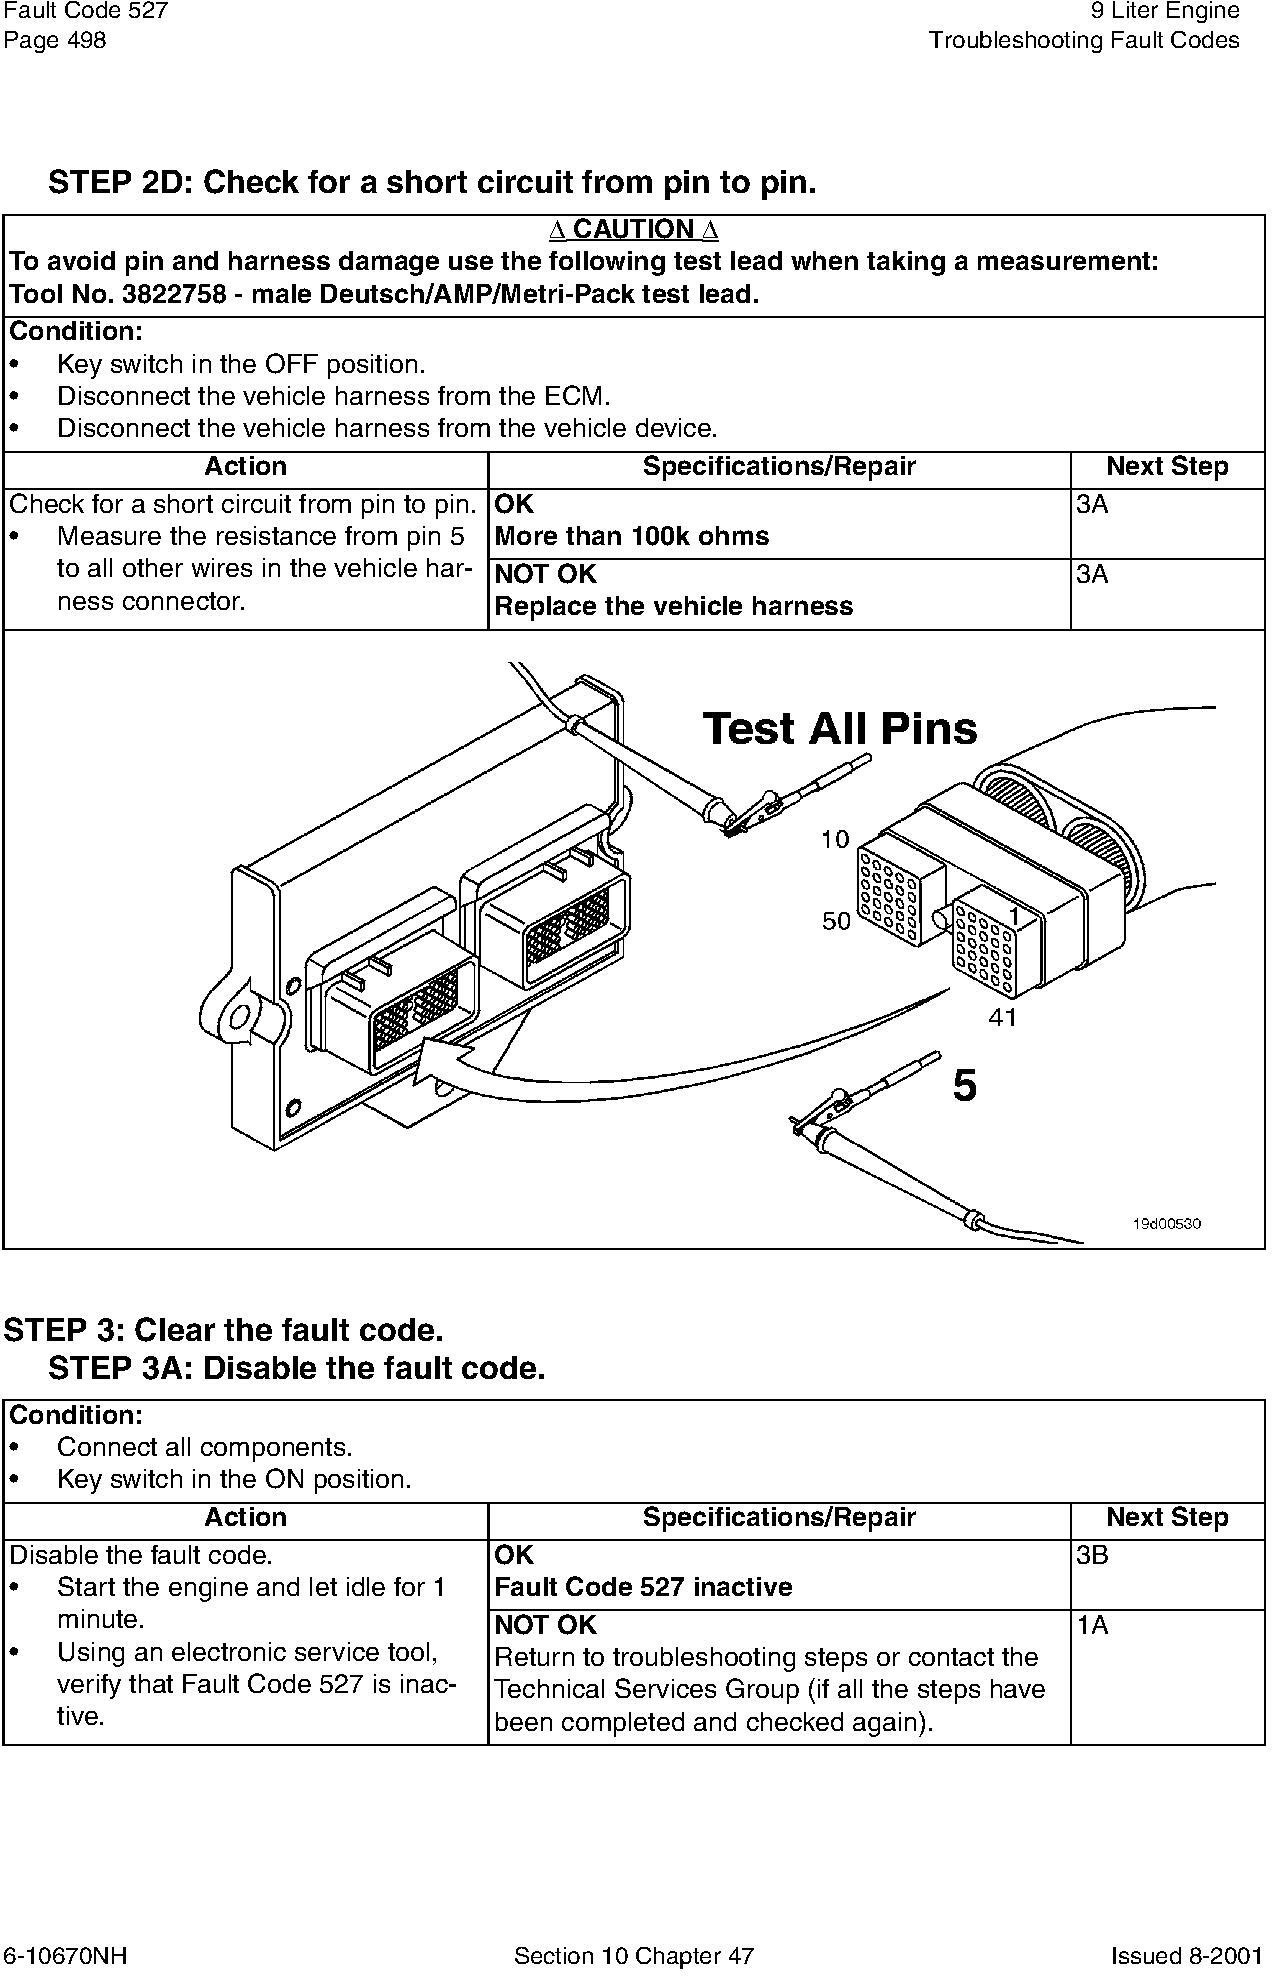 New Holland TJ275, TJ325, TJ375, TJ425, TJ450, TJ500 Tractors Complete Service Manual - 3